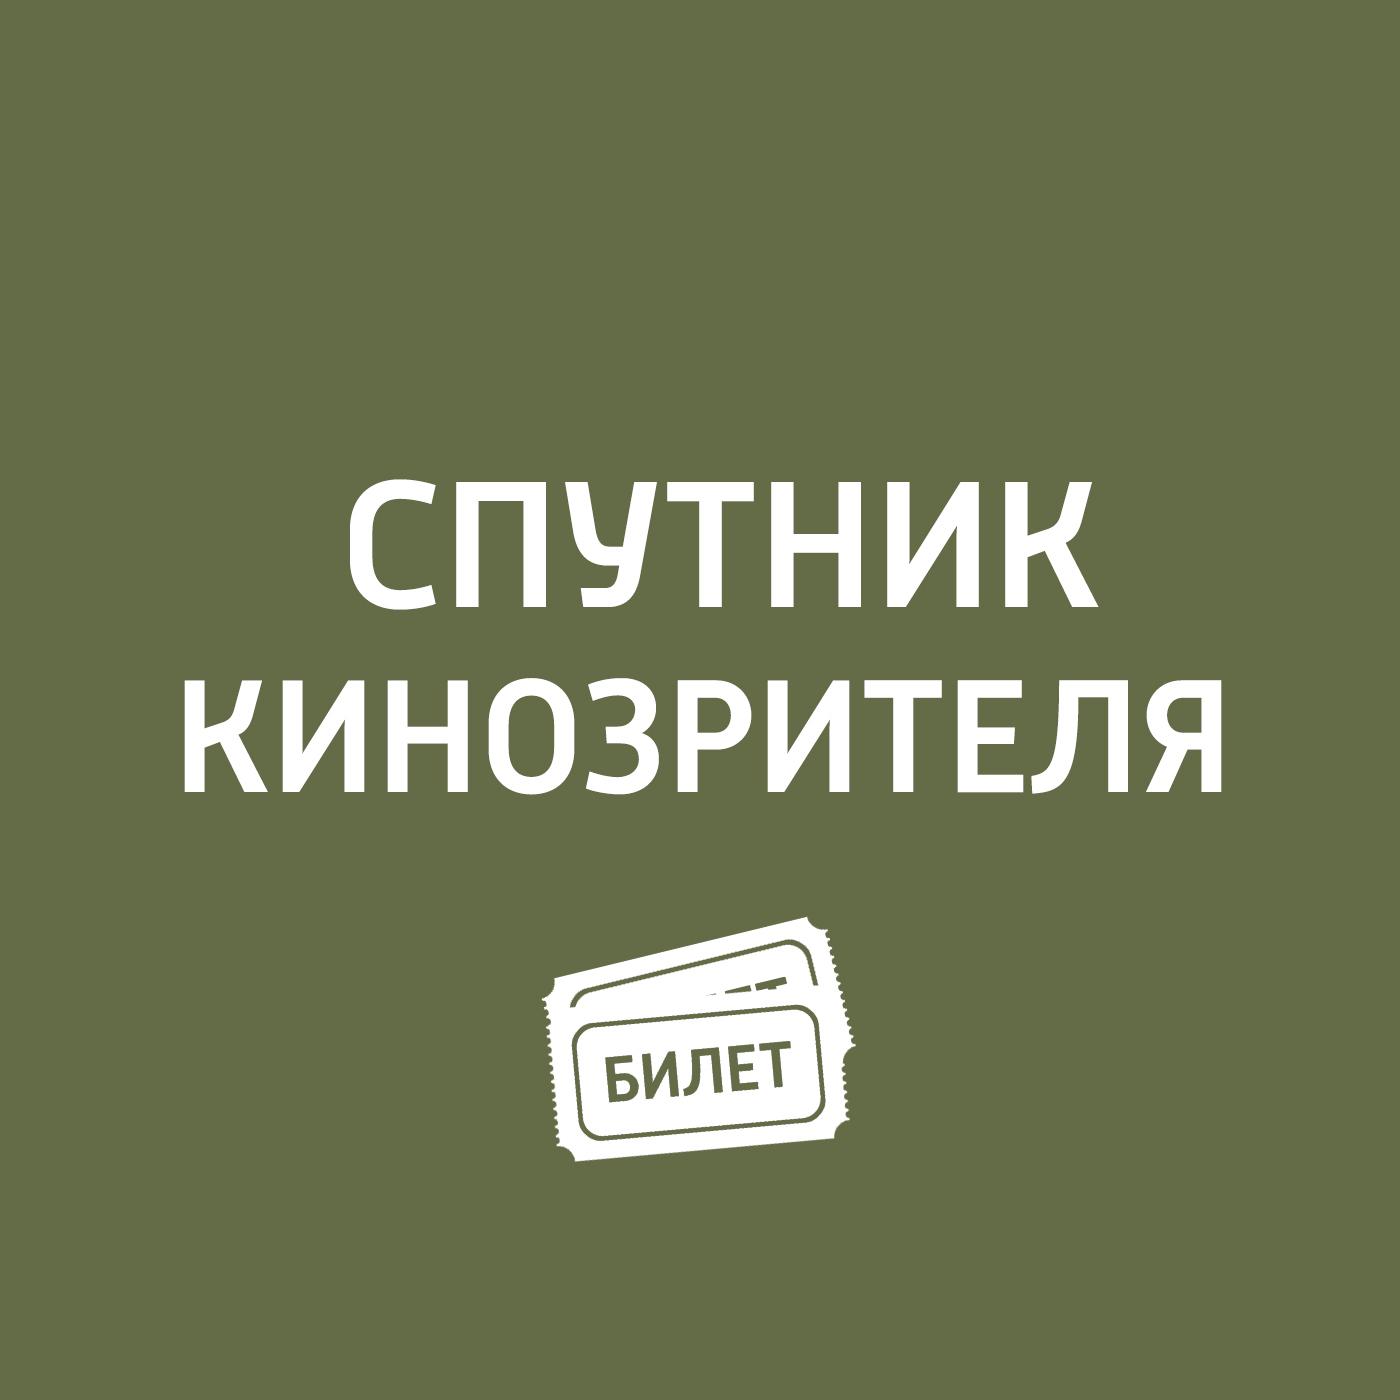 Антон Долин Лучшее. Аки Каурисмяки iki юбка до колена